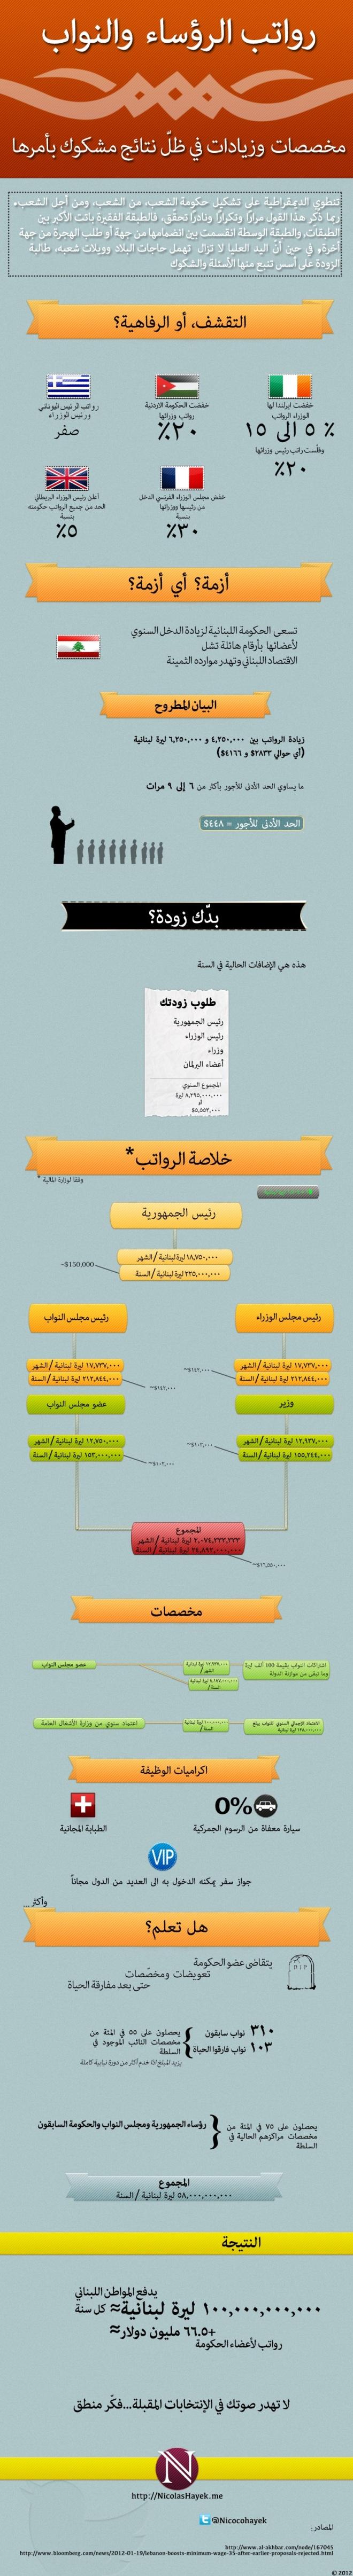 Lebanese Politicians and their Salaries [Arabic]